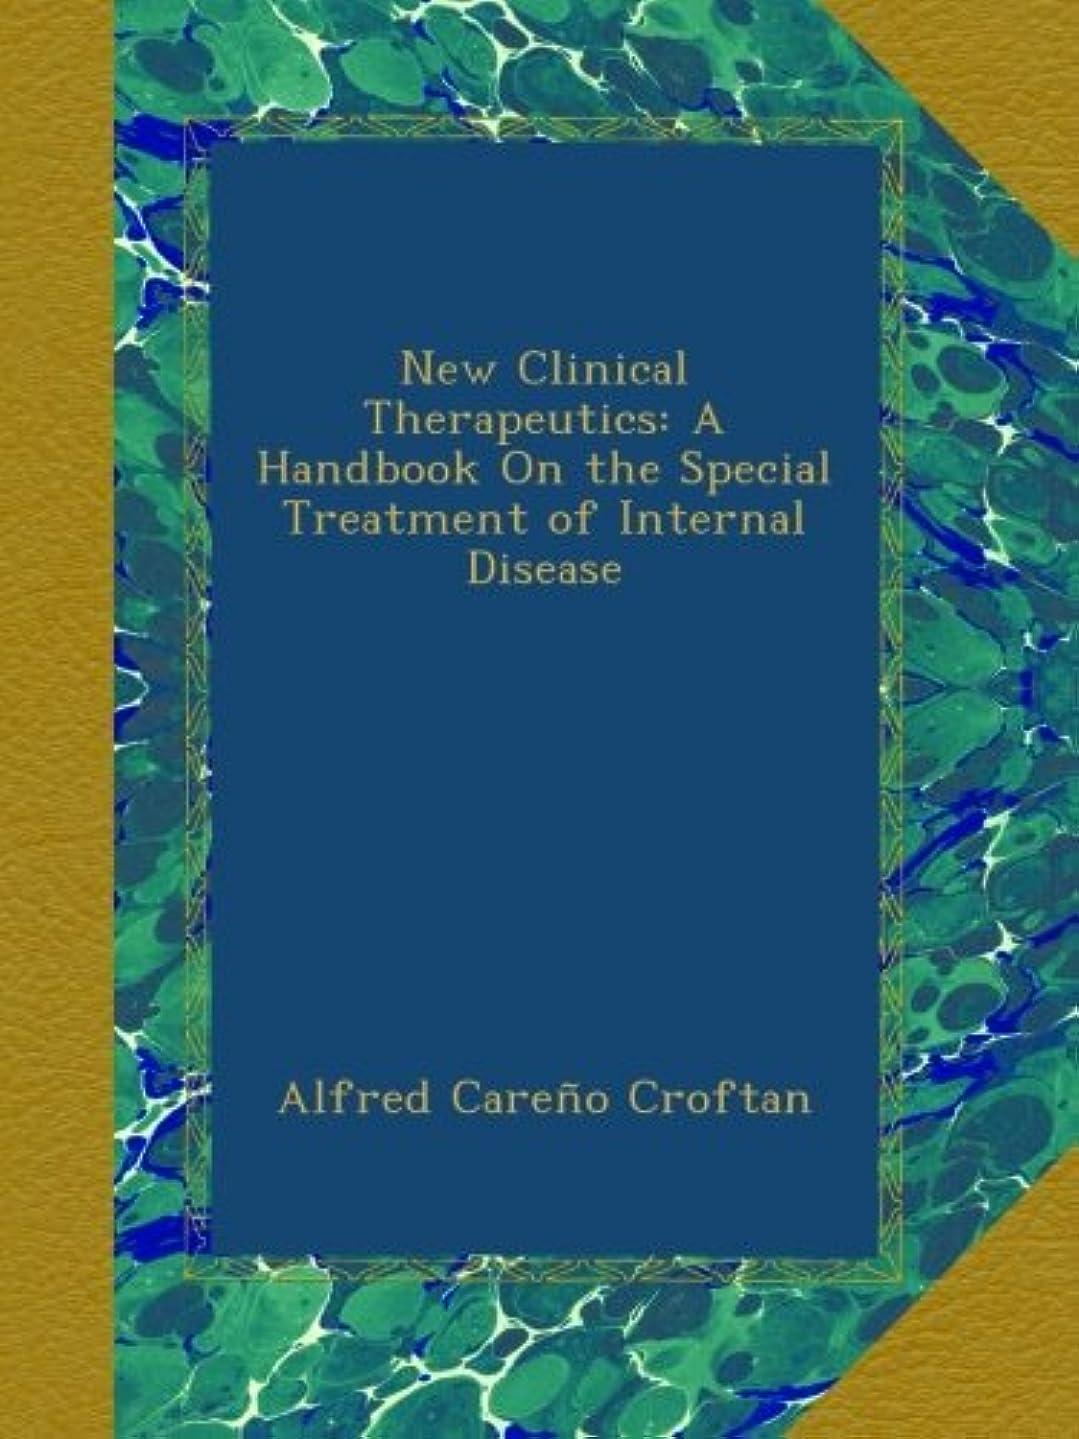 希少性接触電圧New Clinical Therapeutics: A Handbook On the Special Treatment of Internal Disease